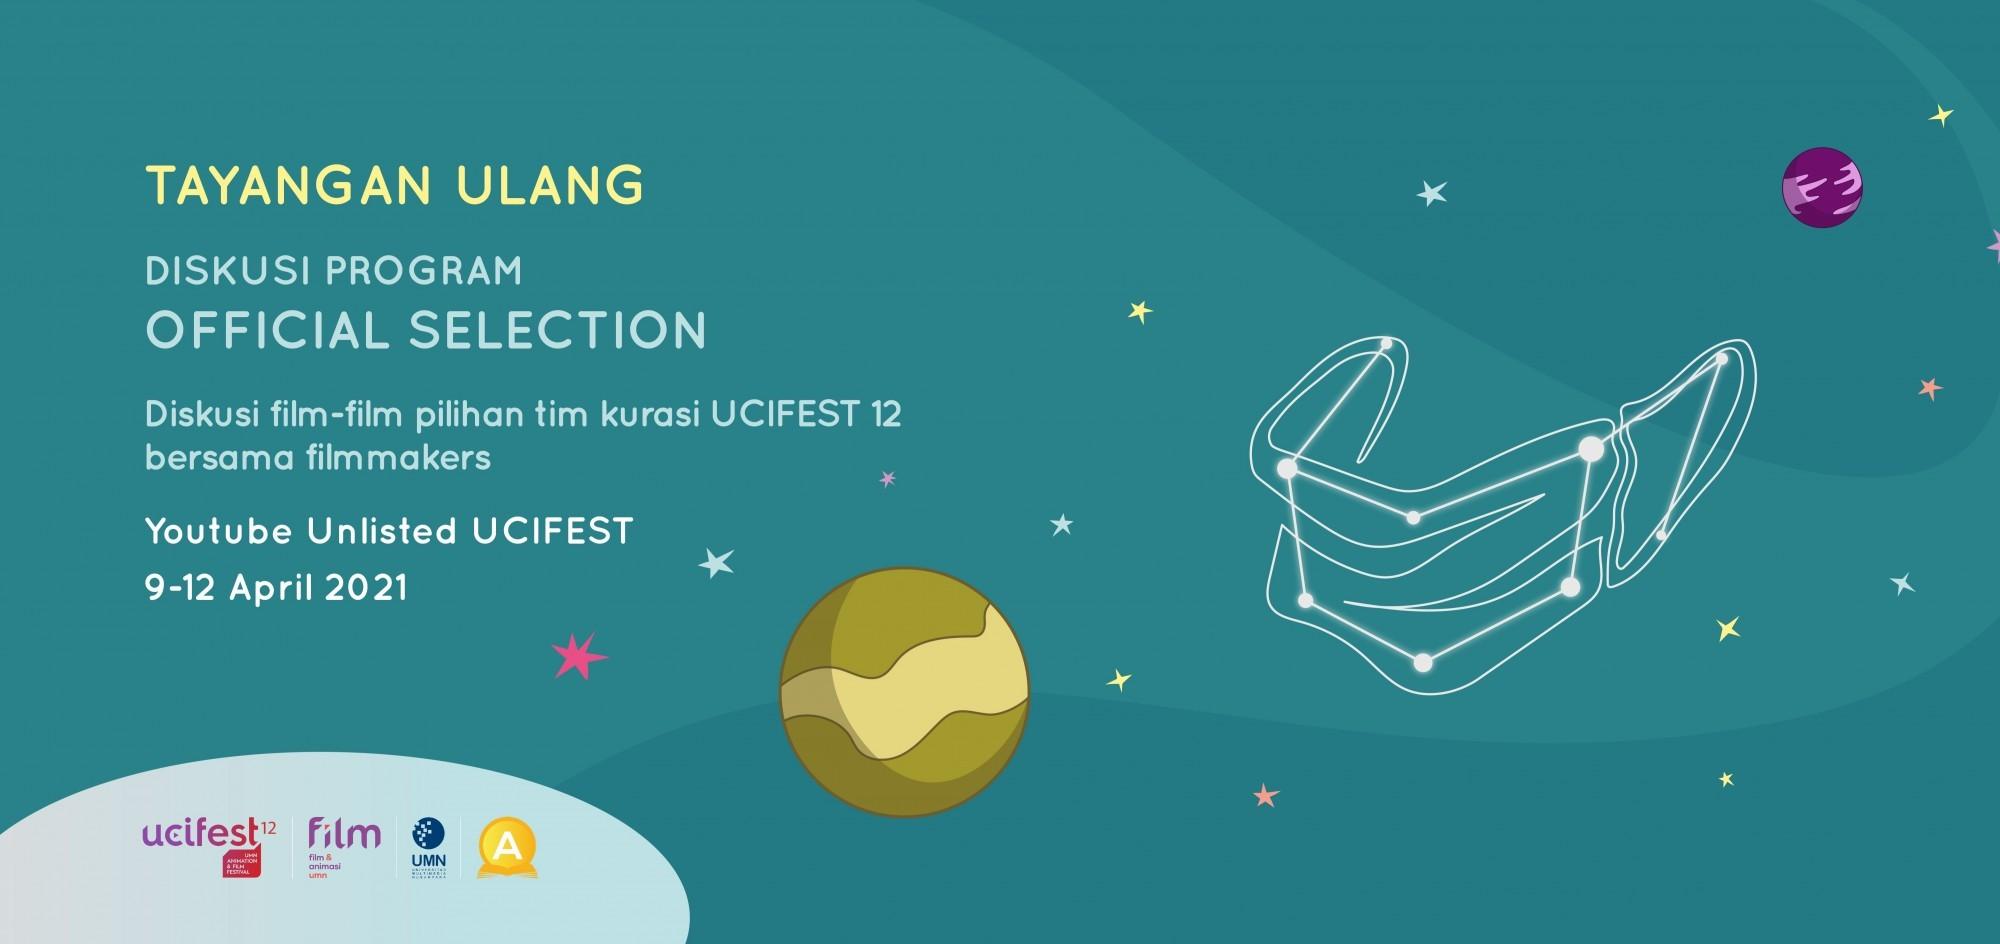 TAYANGAN ULANG DISKUSI PROGRAM: OFFICIAL SELECTION